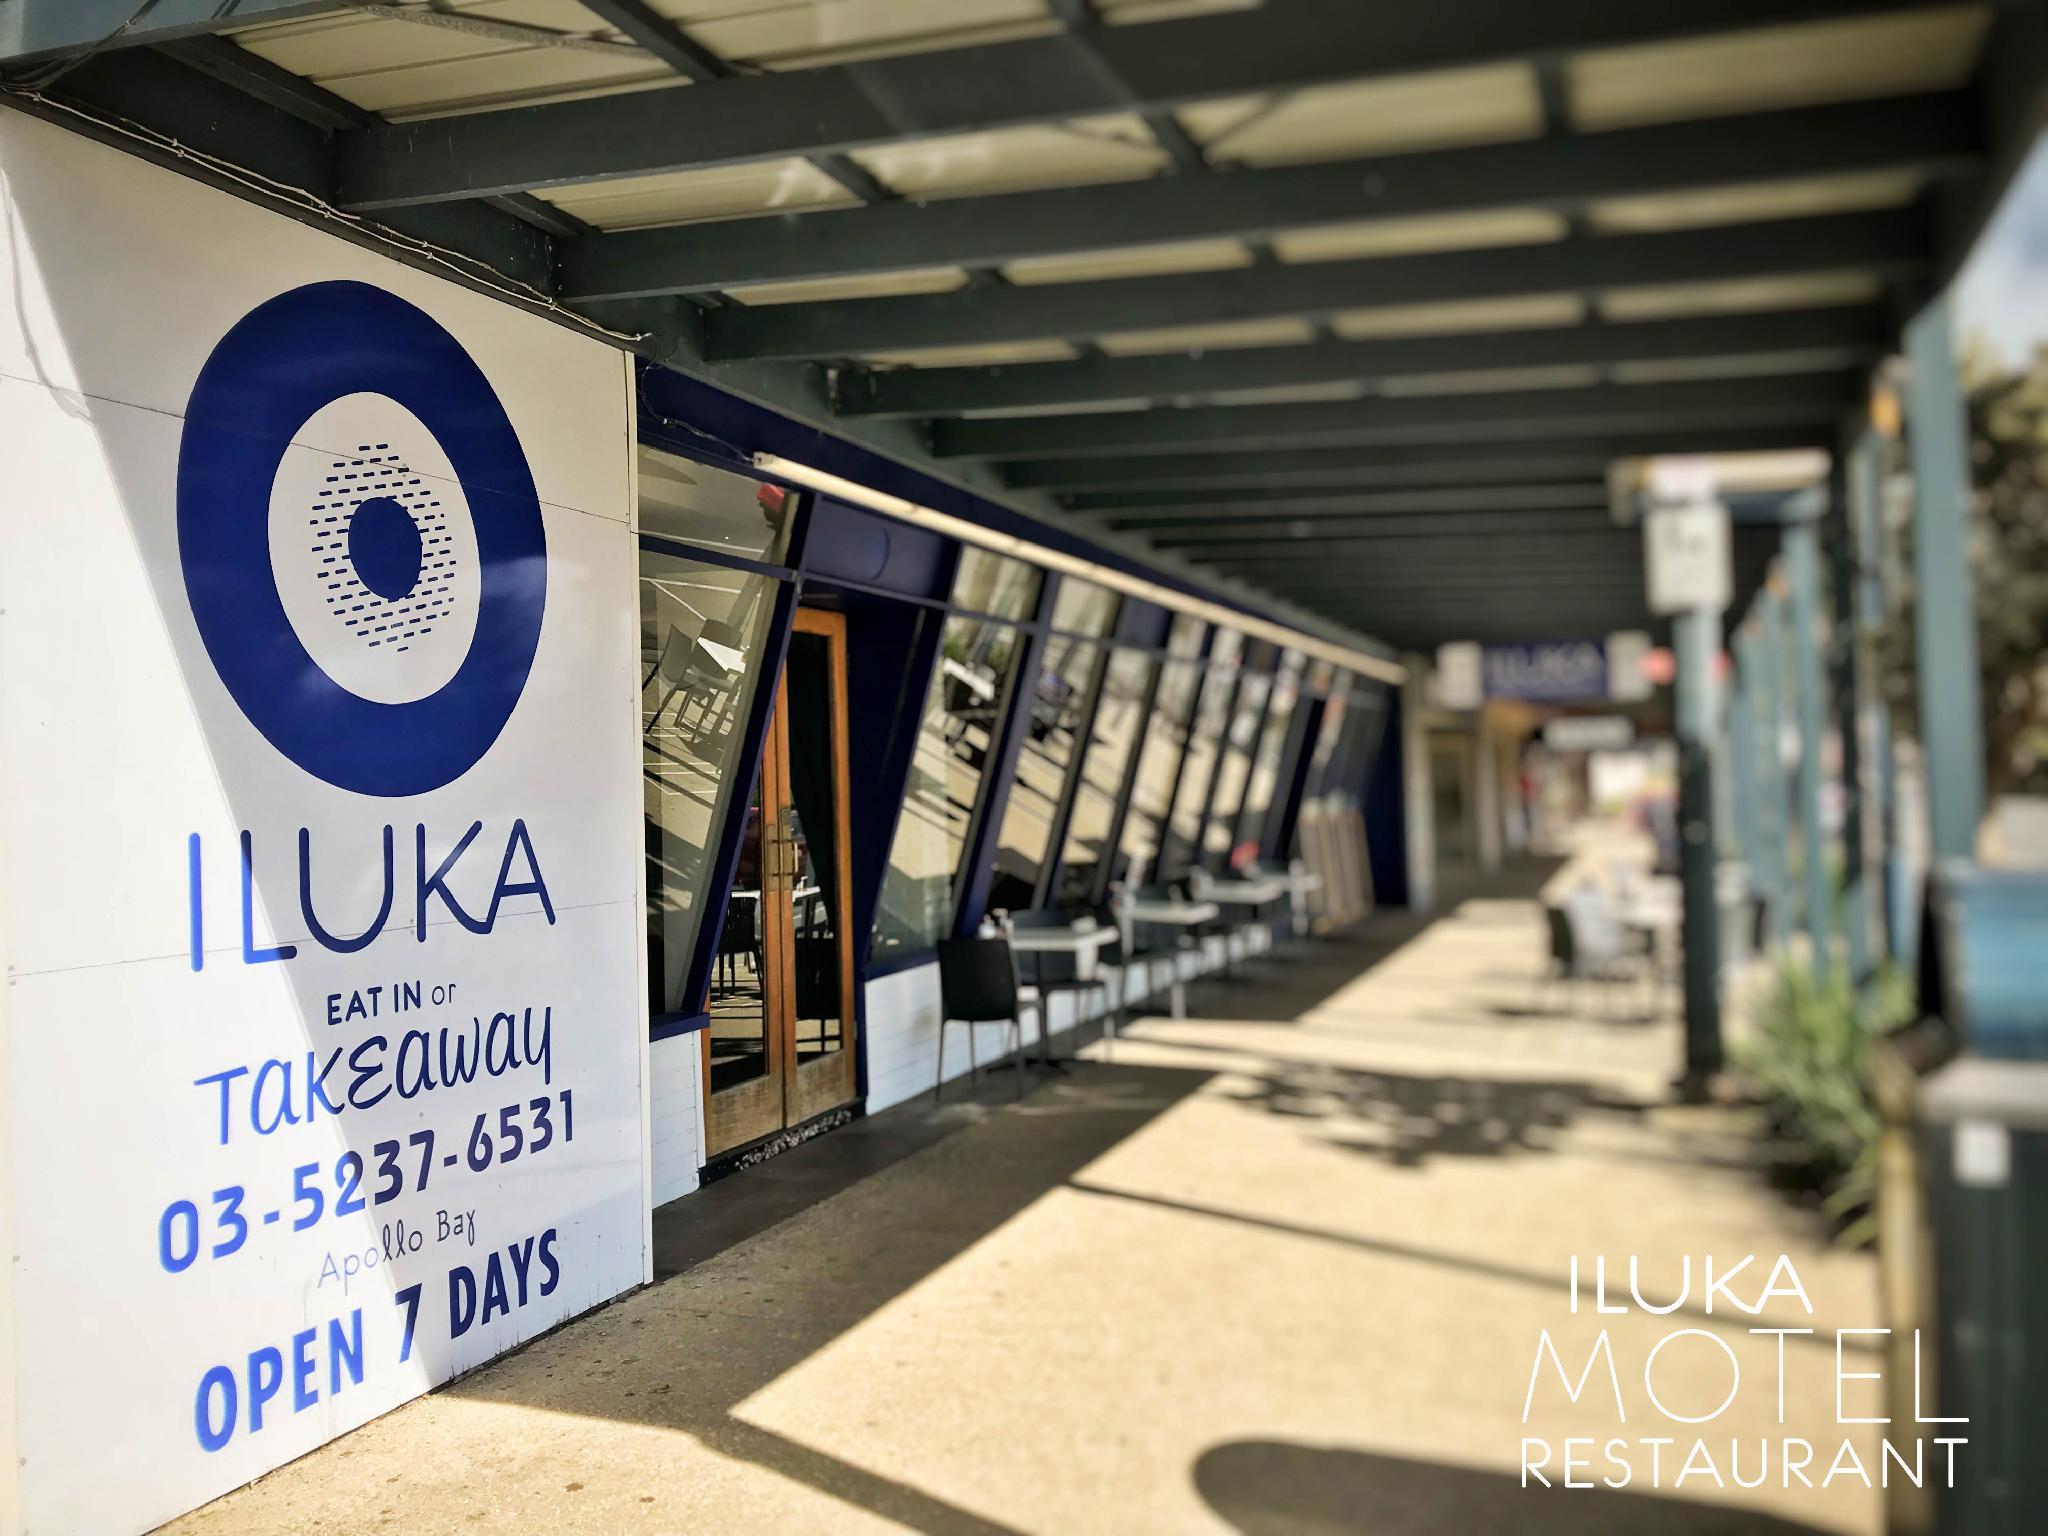 Iluka Motel And Restaurant